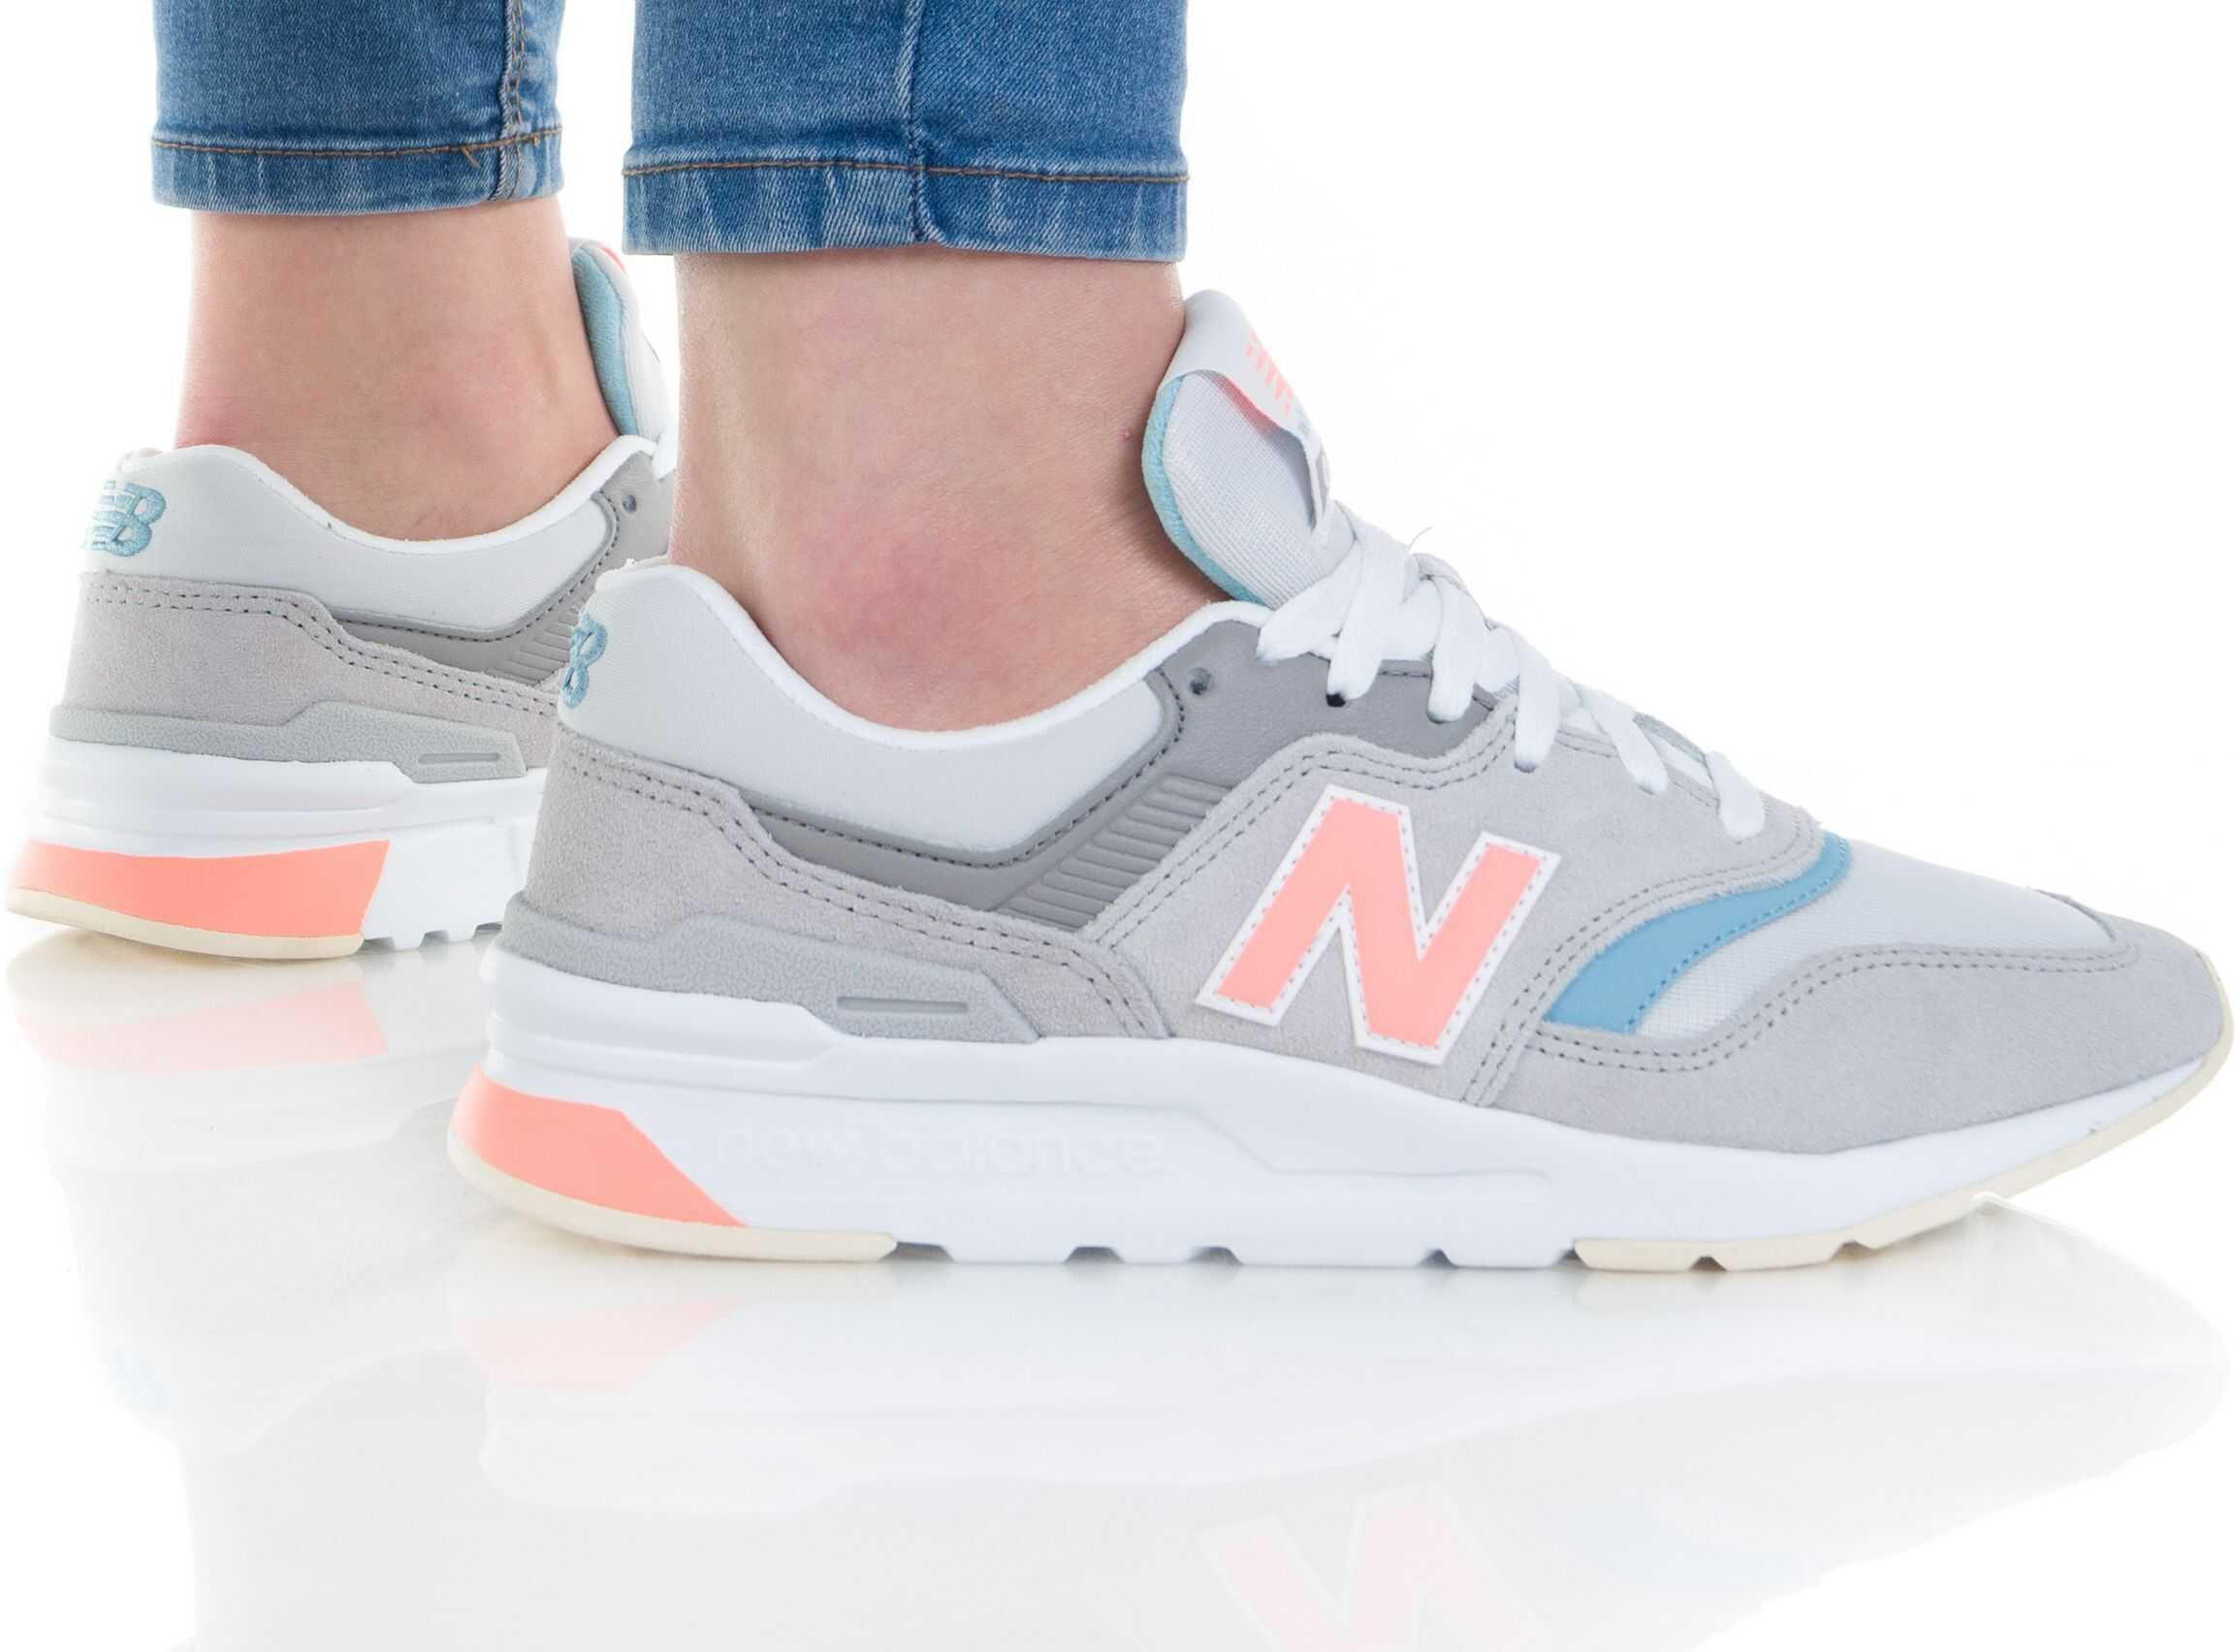 New Balance 997 Gri/Argintiu